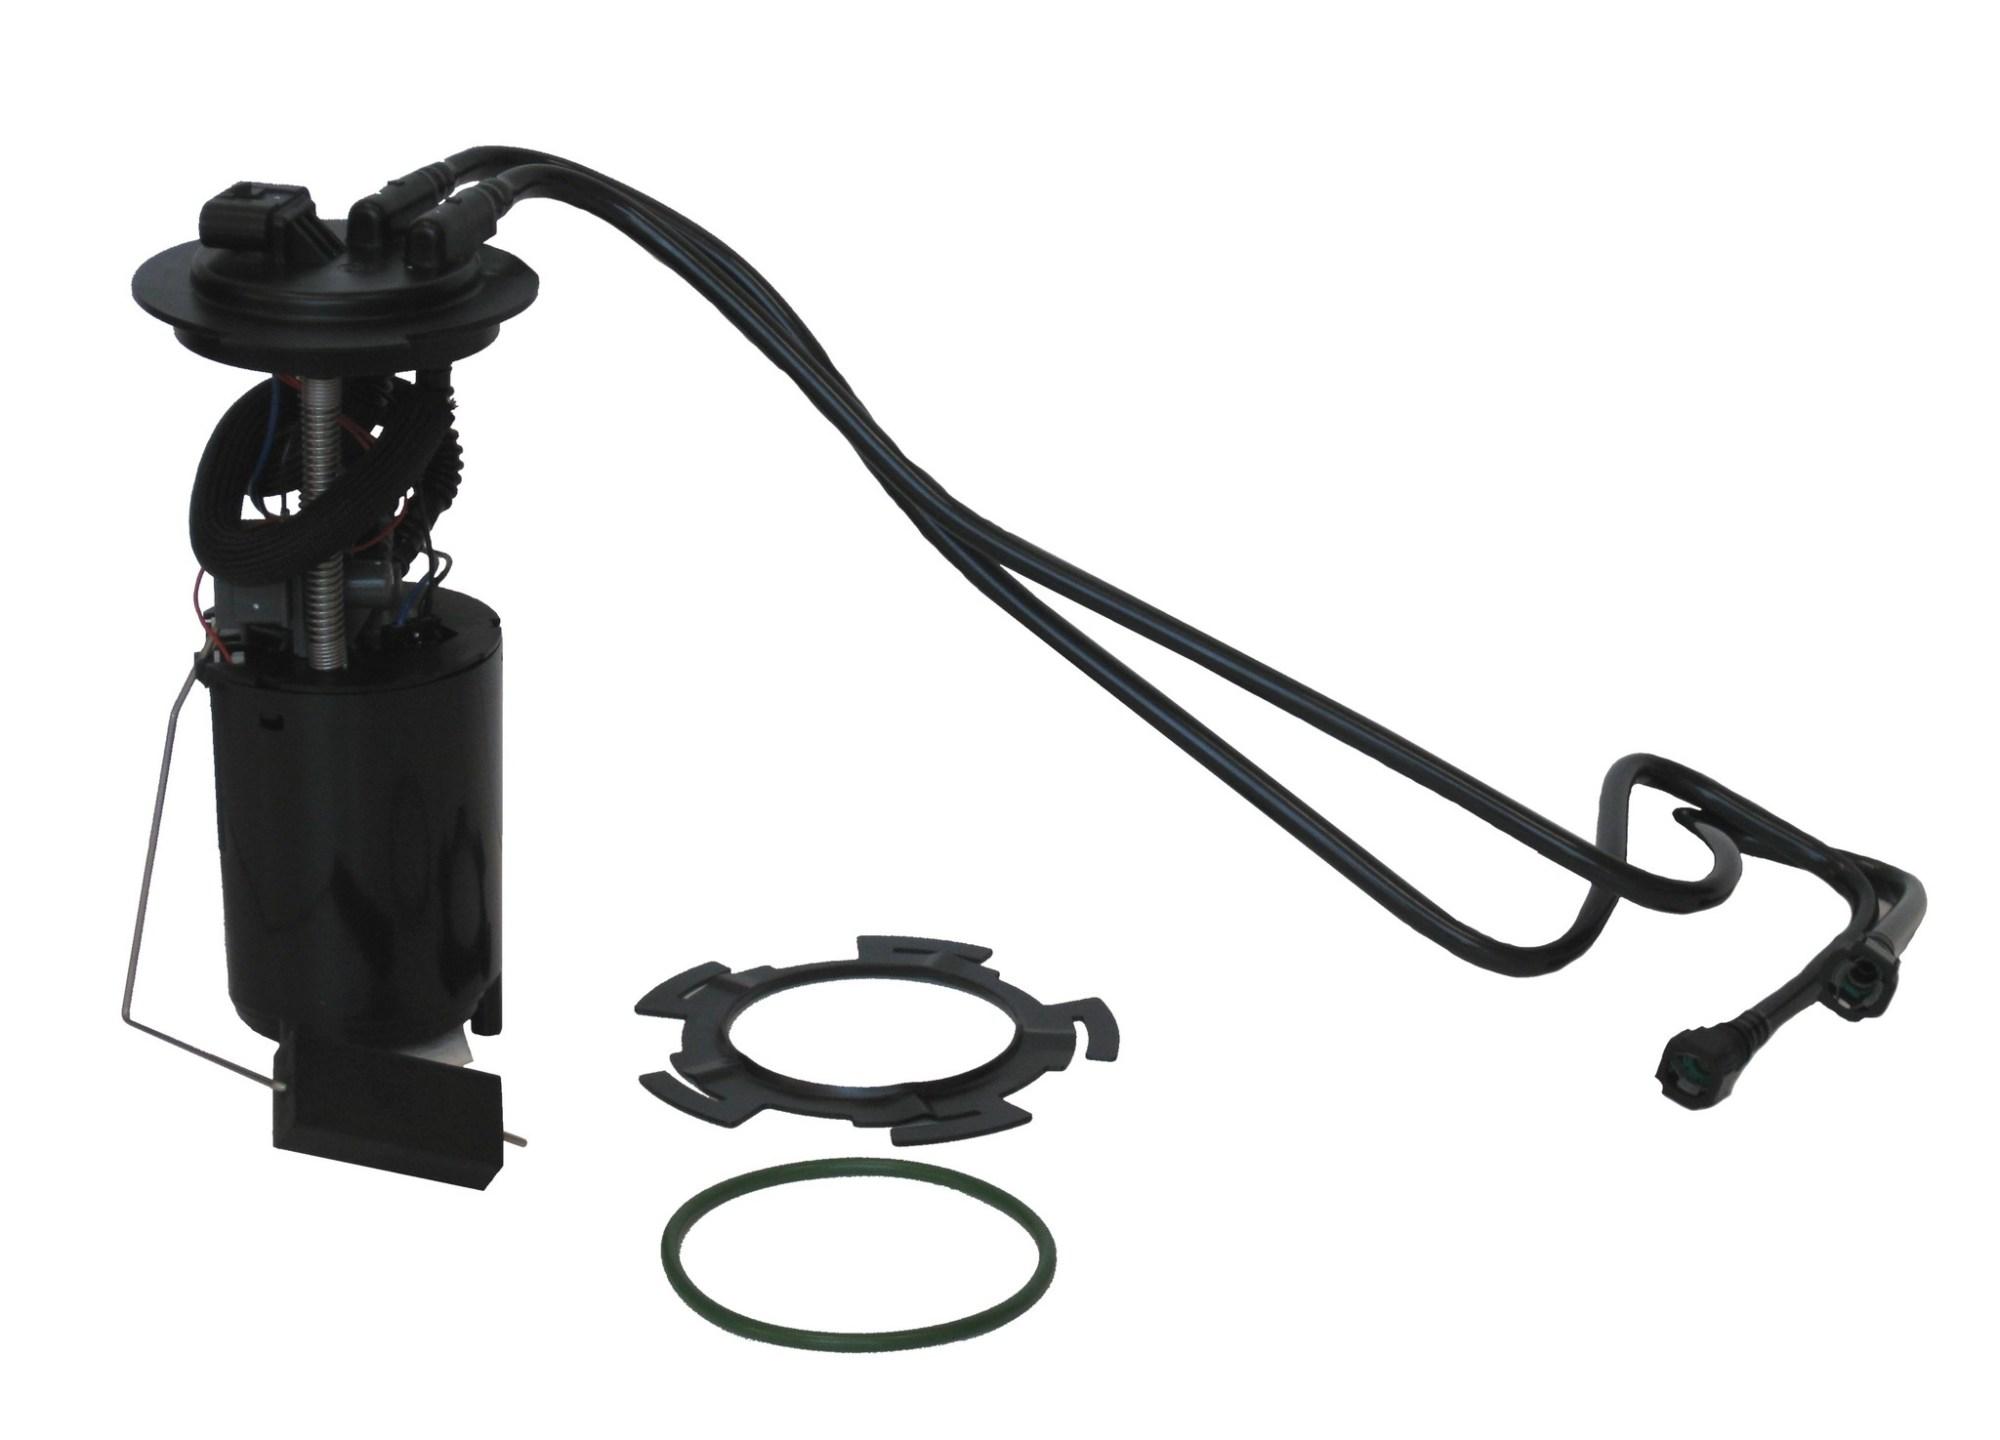 hight resolution of 2008 chevrolet cobalt fuel pump module assembly a0 f2737a